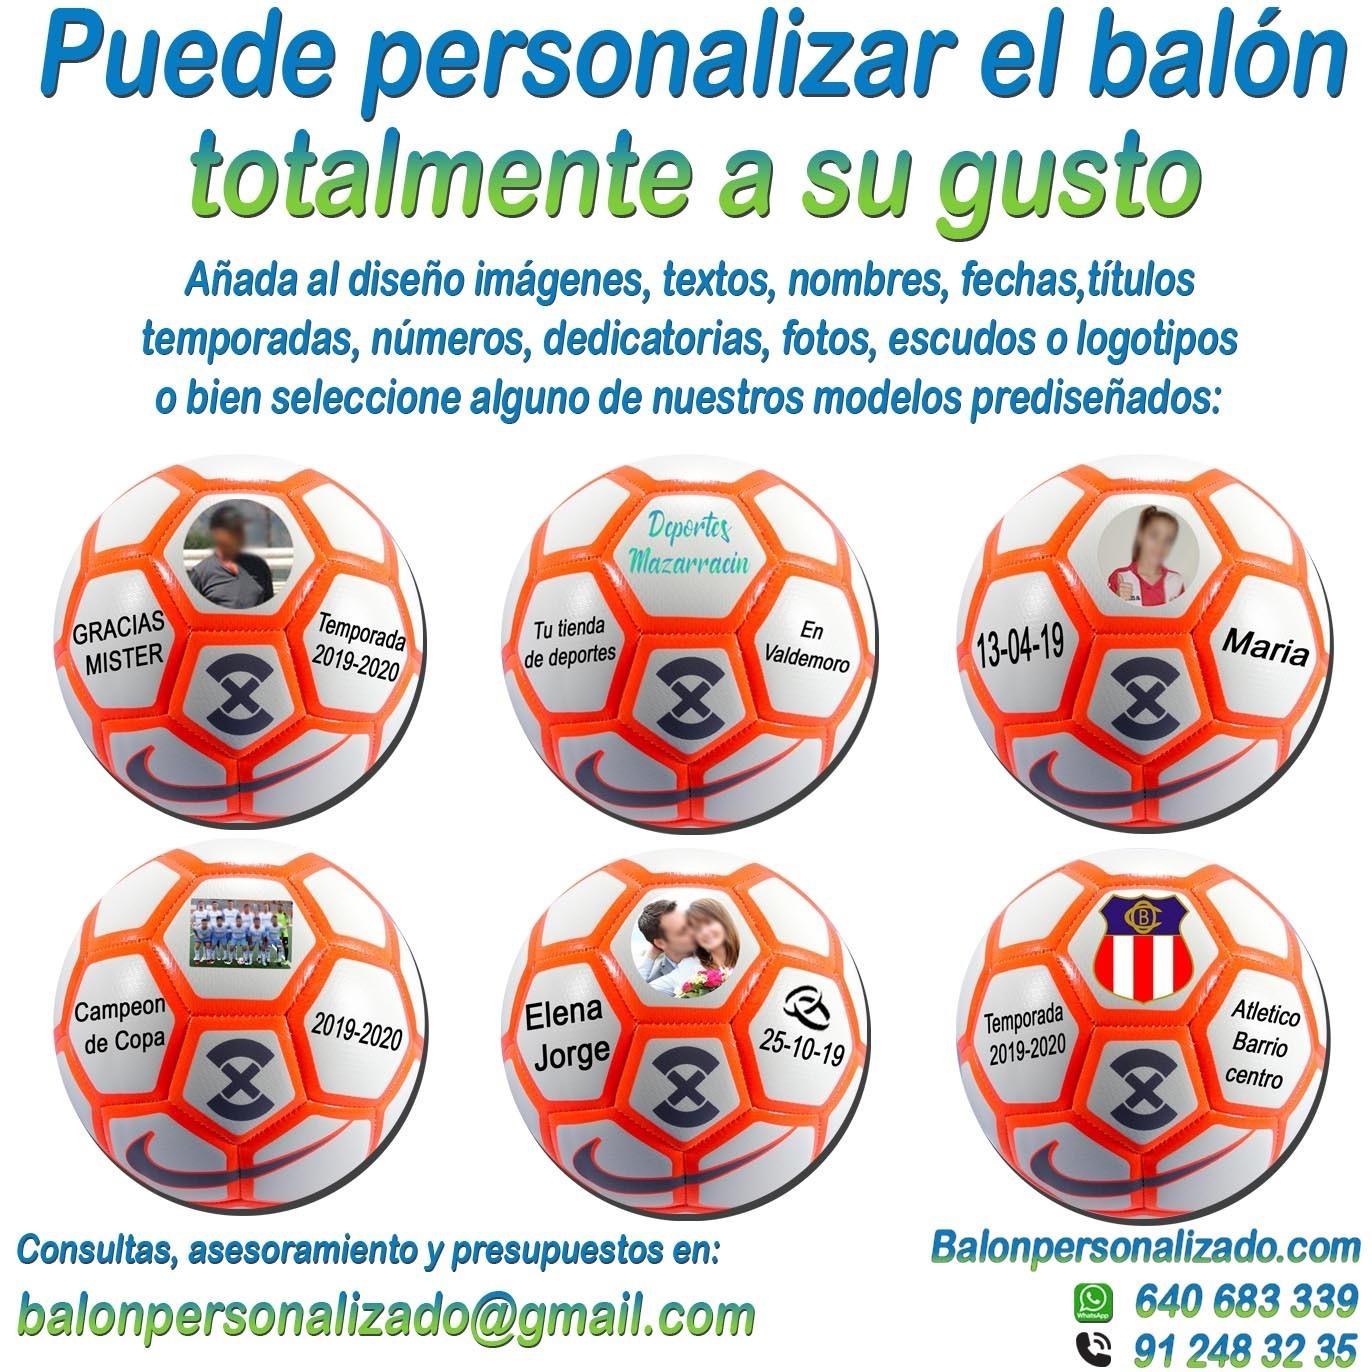 Prematuro interfaz becerro  Balón Fútbol Personalizable imagen texto nombre dedicatoria nike Strik